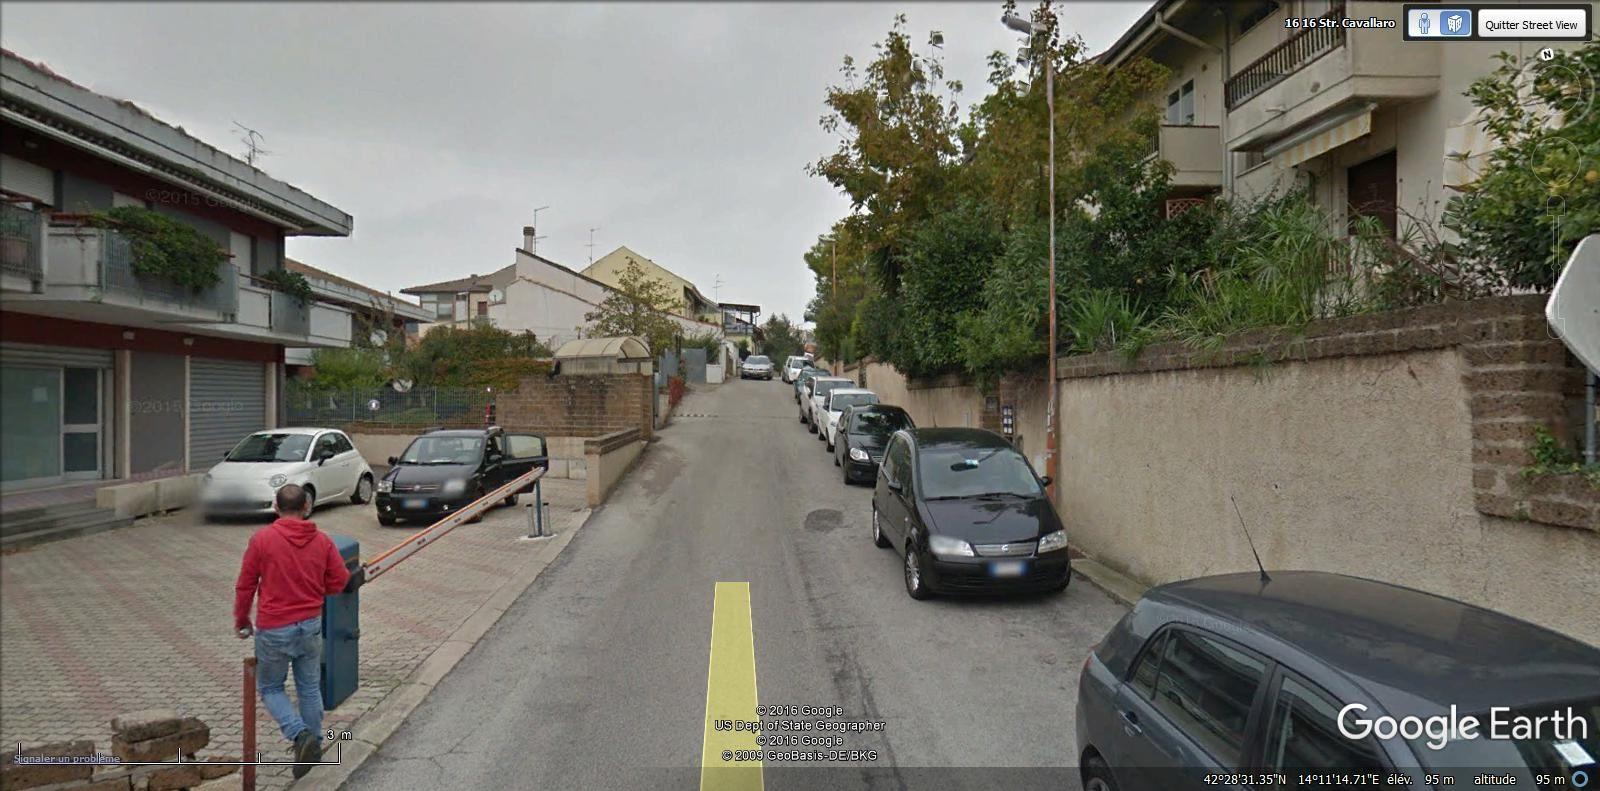 strada Cavallaro